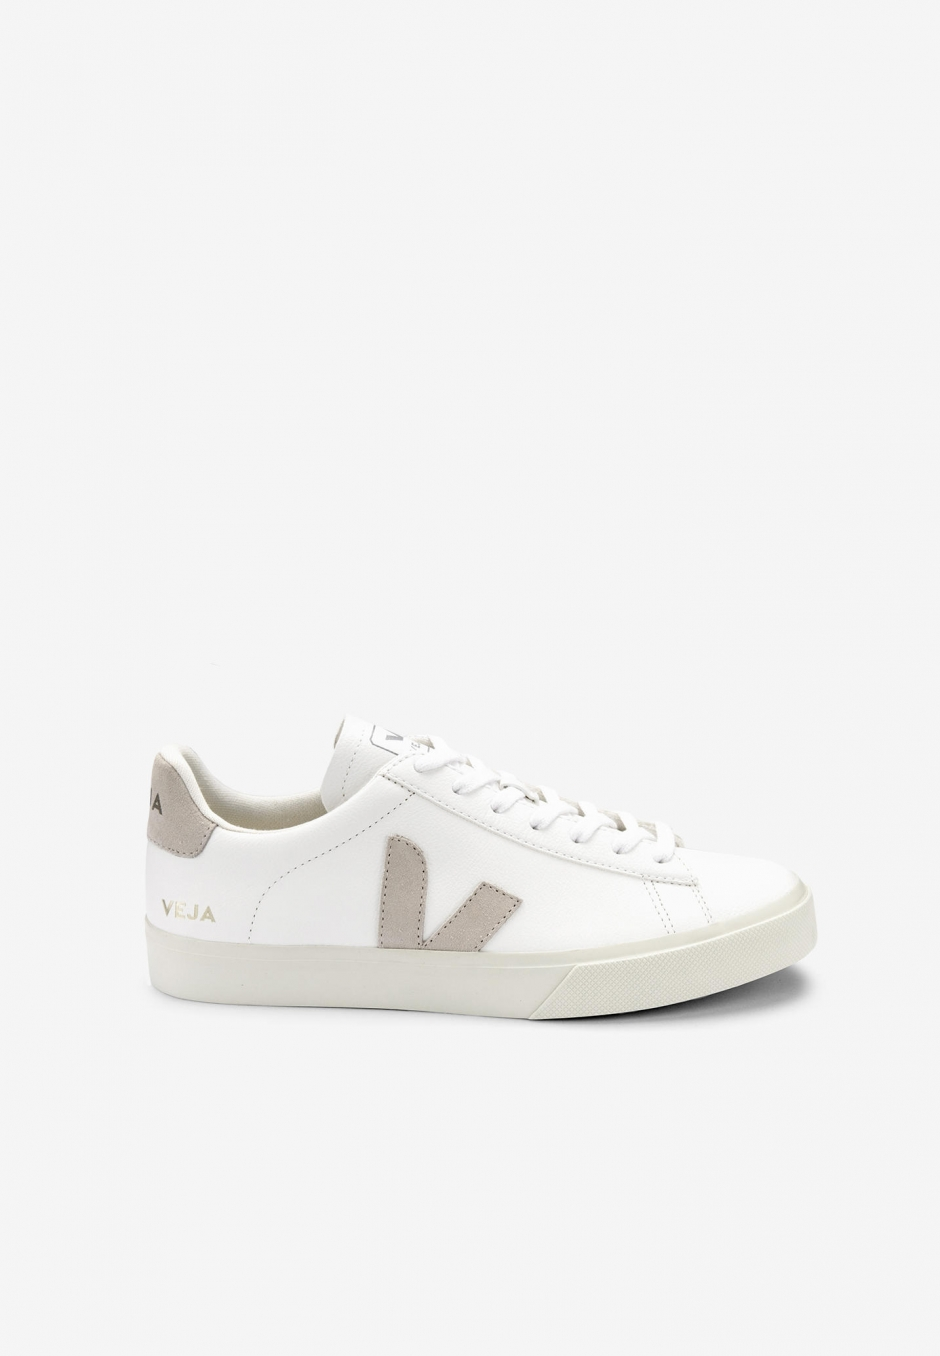 Veja Man Campo Chromefree Leather White Natural